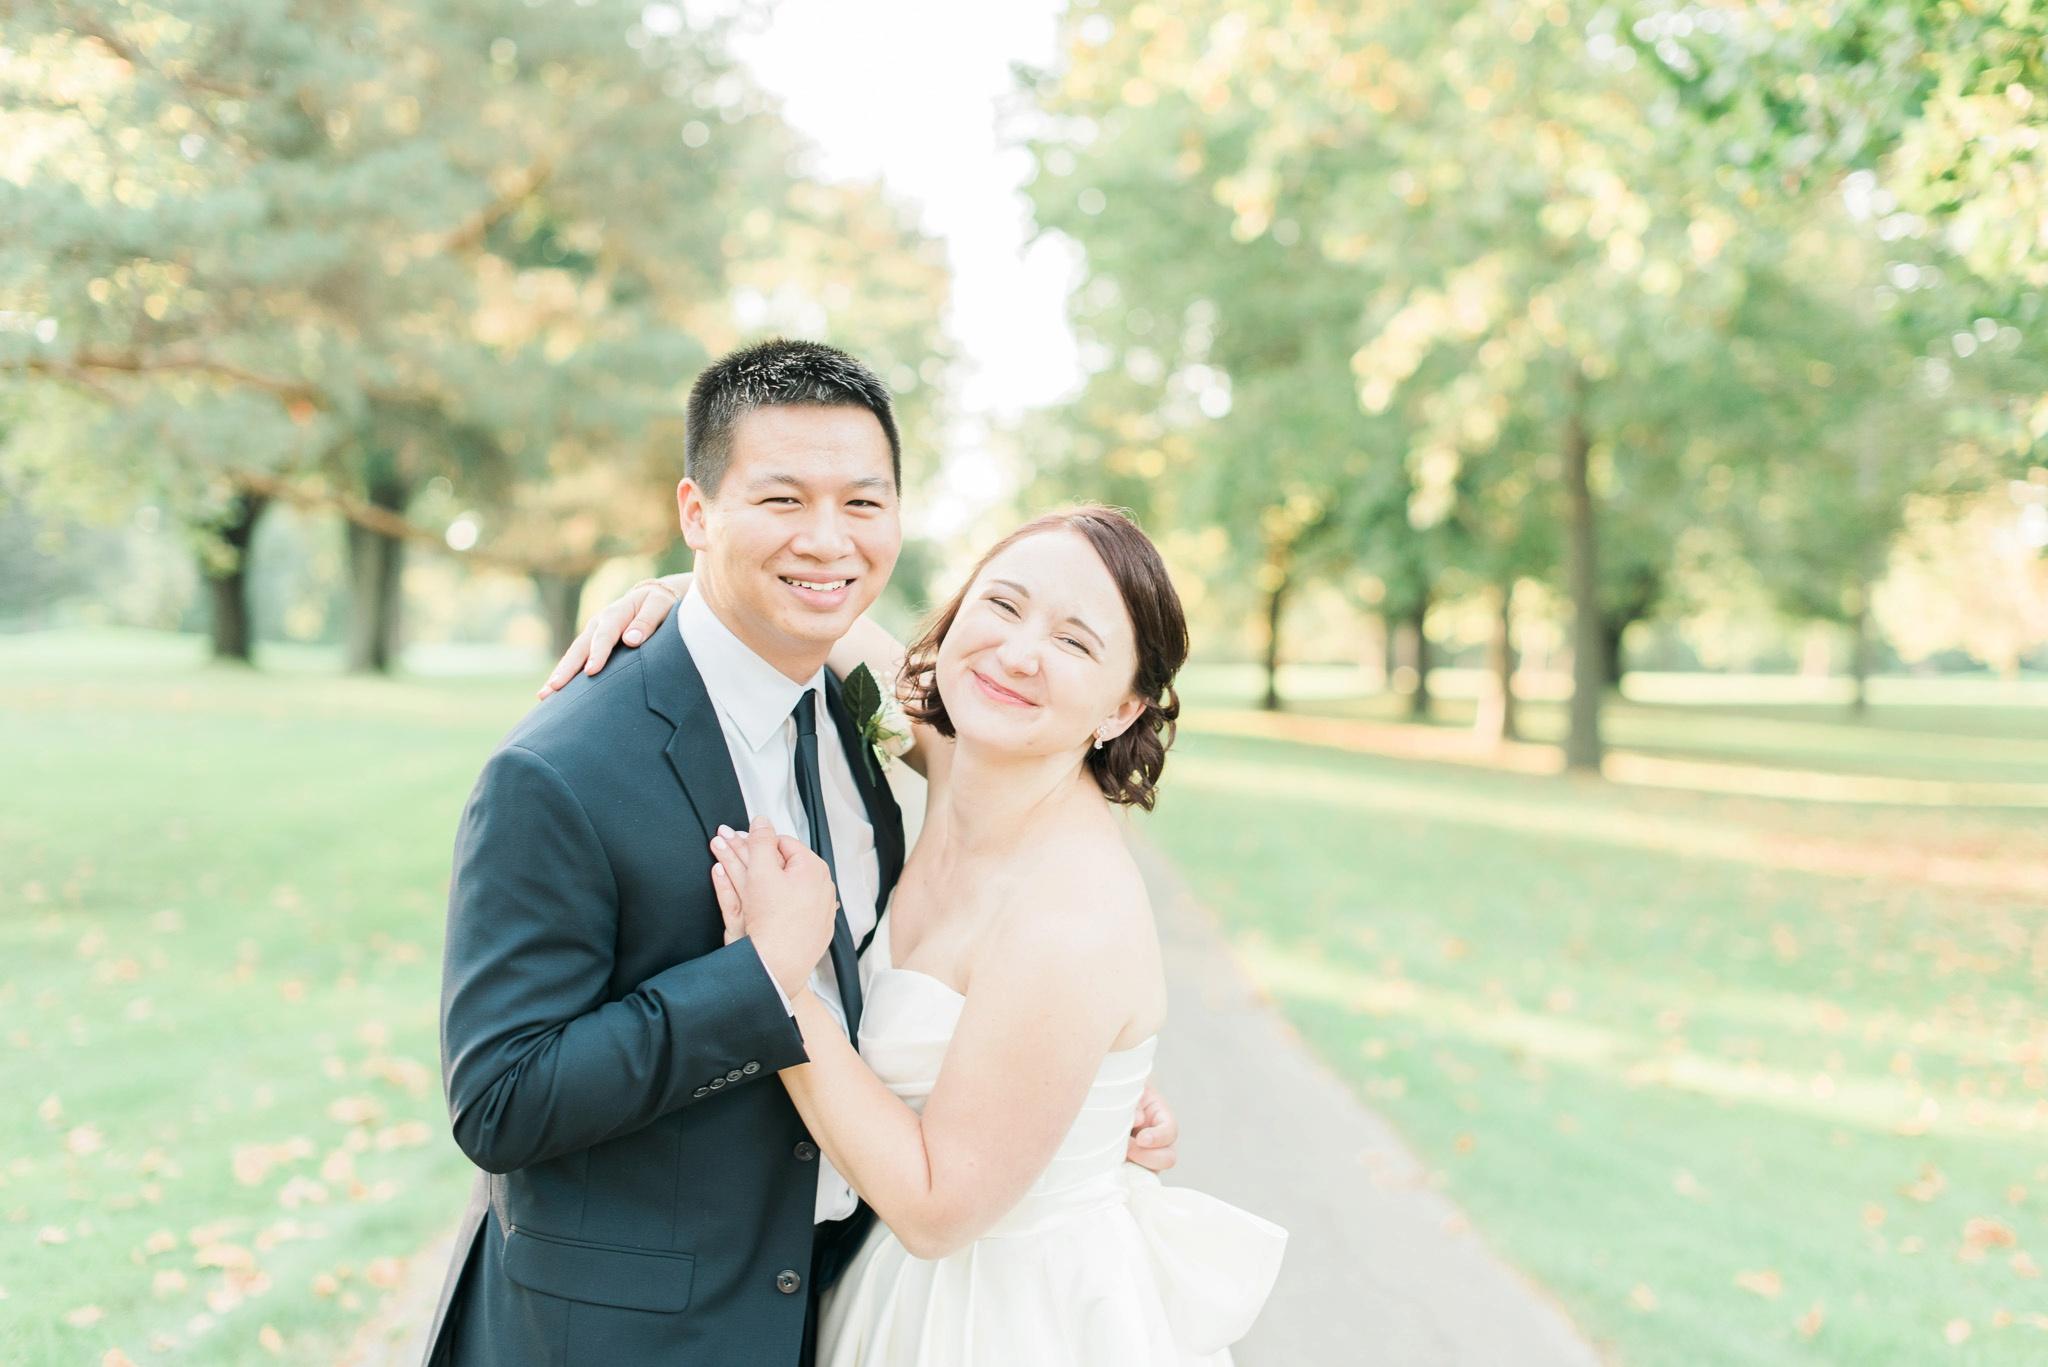 brookside-golf-country-club-wedding-columbus-ohio-119.jpg